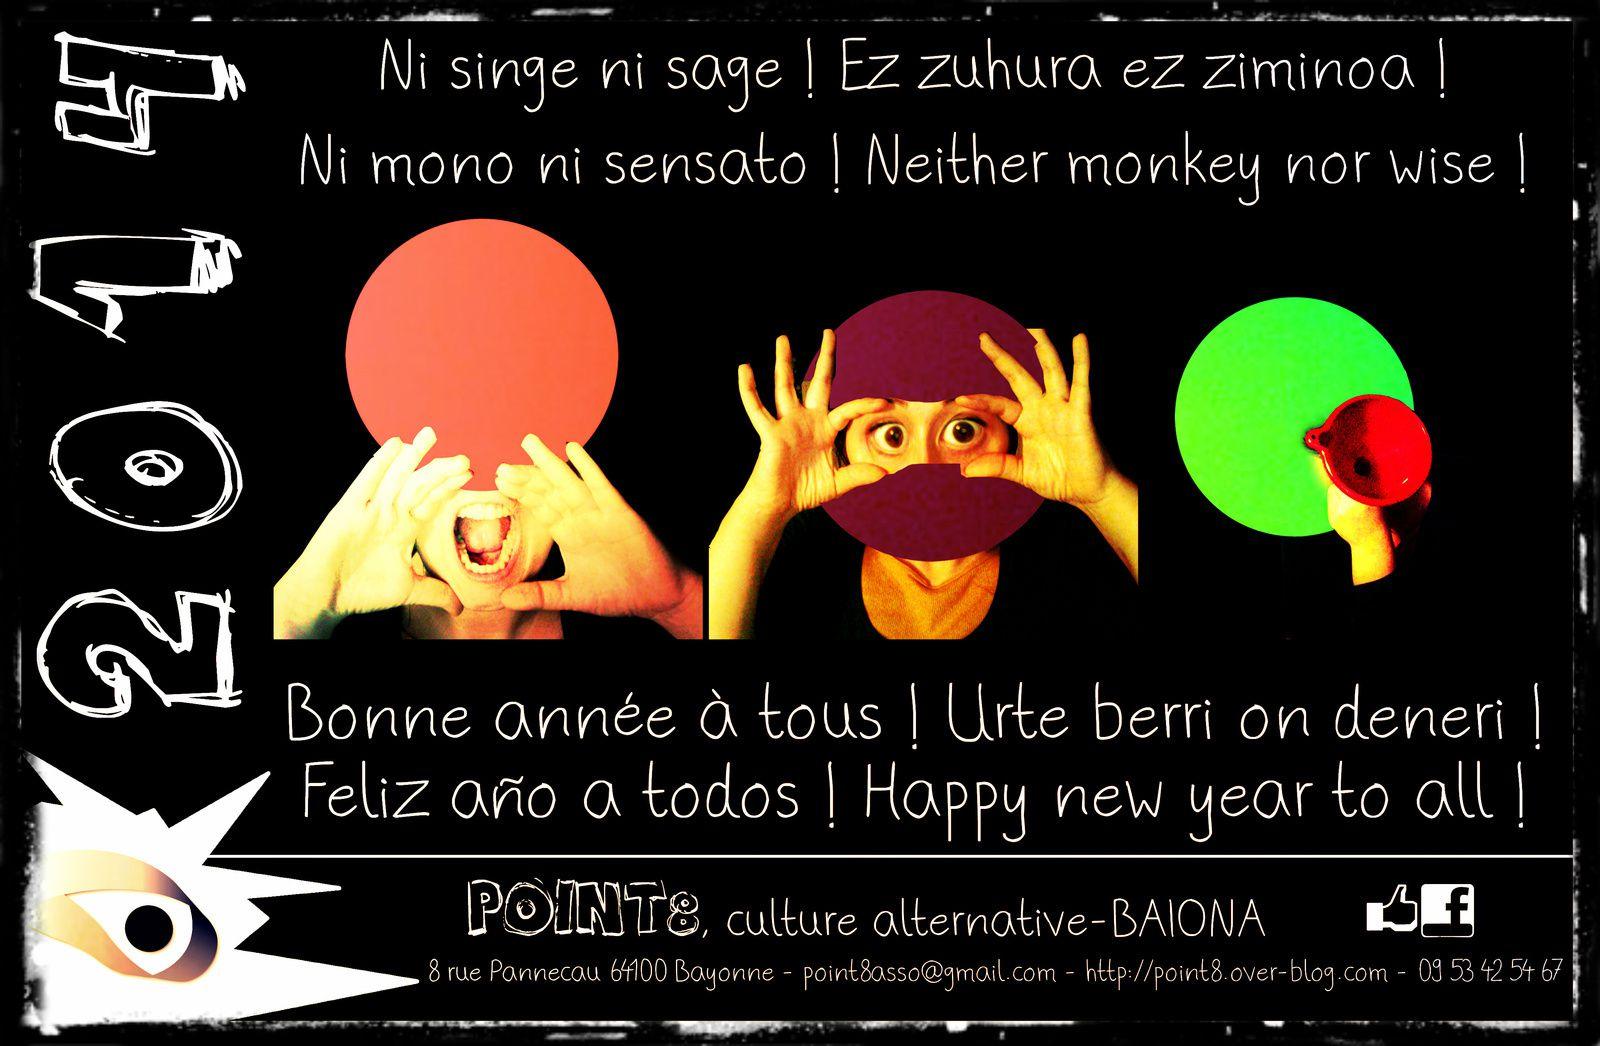 Bonne année à tous ! Urte berri on deneri ! Feliz año a todos ! Happy new year to all !